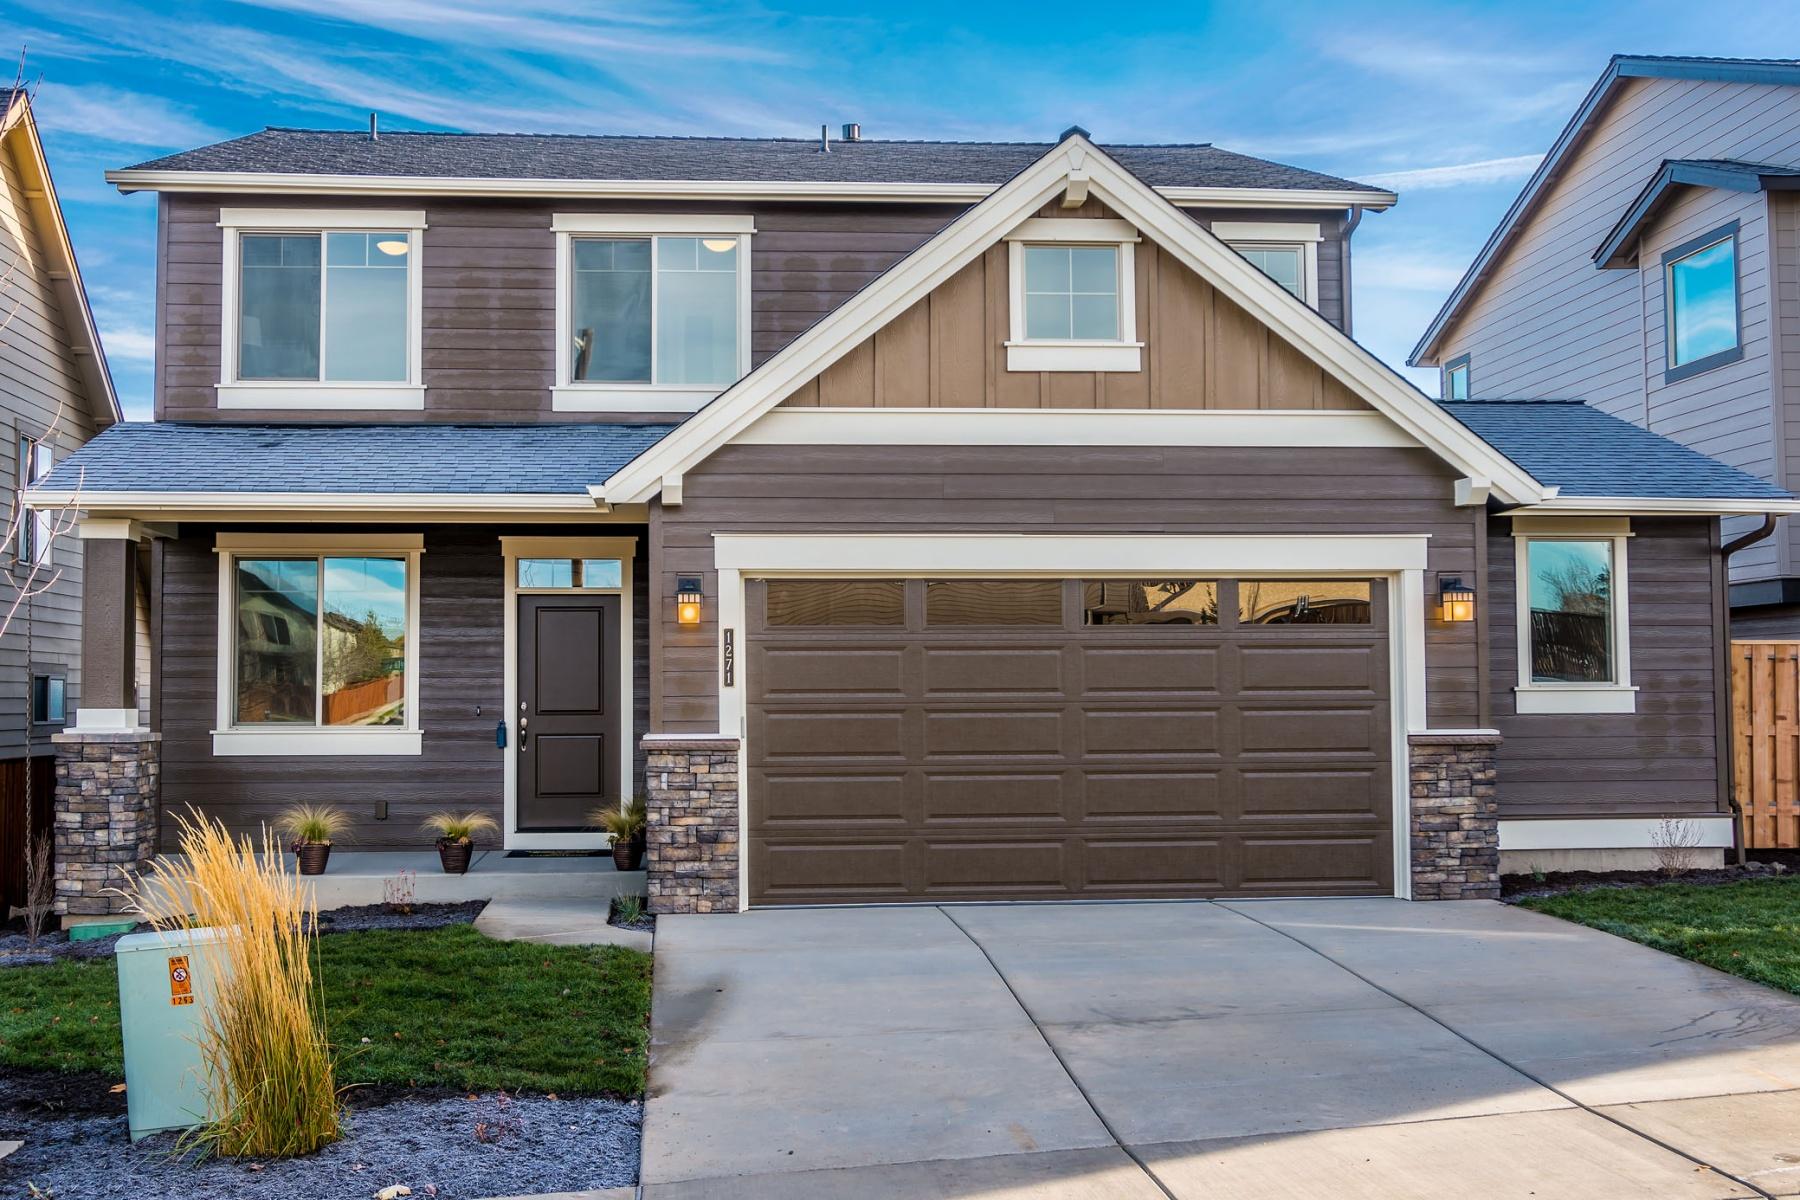 Moradia para Venda às New Construction in Ochoco Pointe 840 NE Steins Pillar Dr Lot 92 Prineville, Oregon, 97754 Estados Unidos